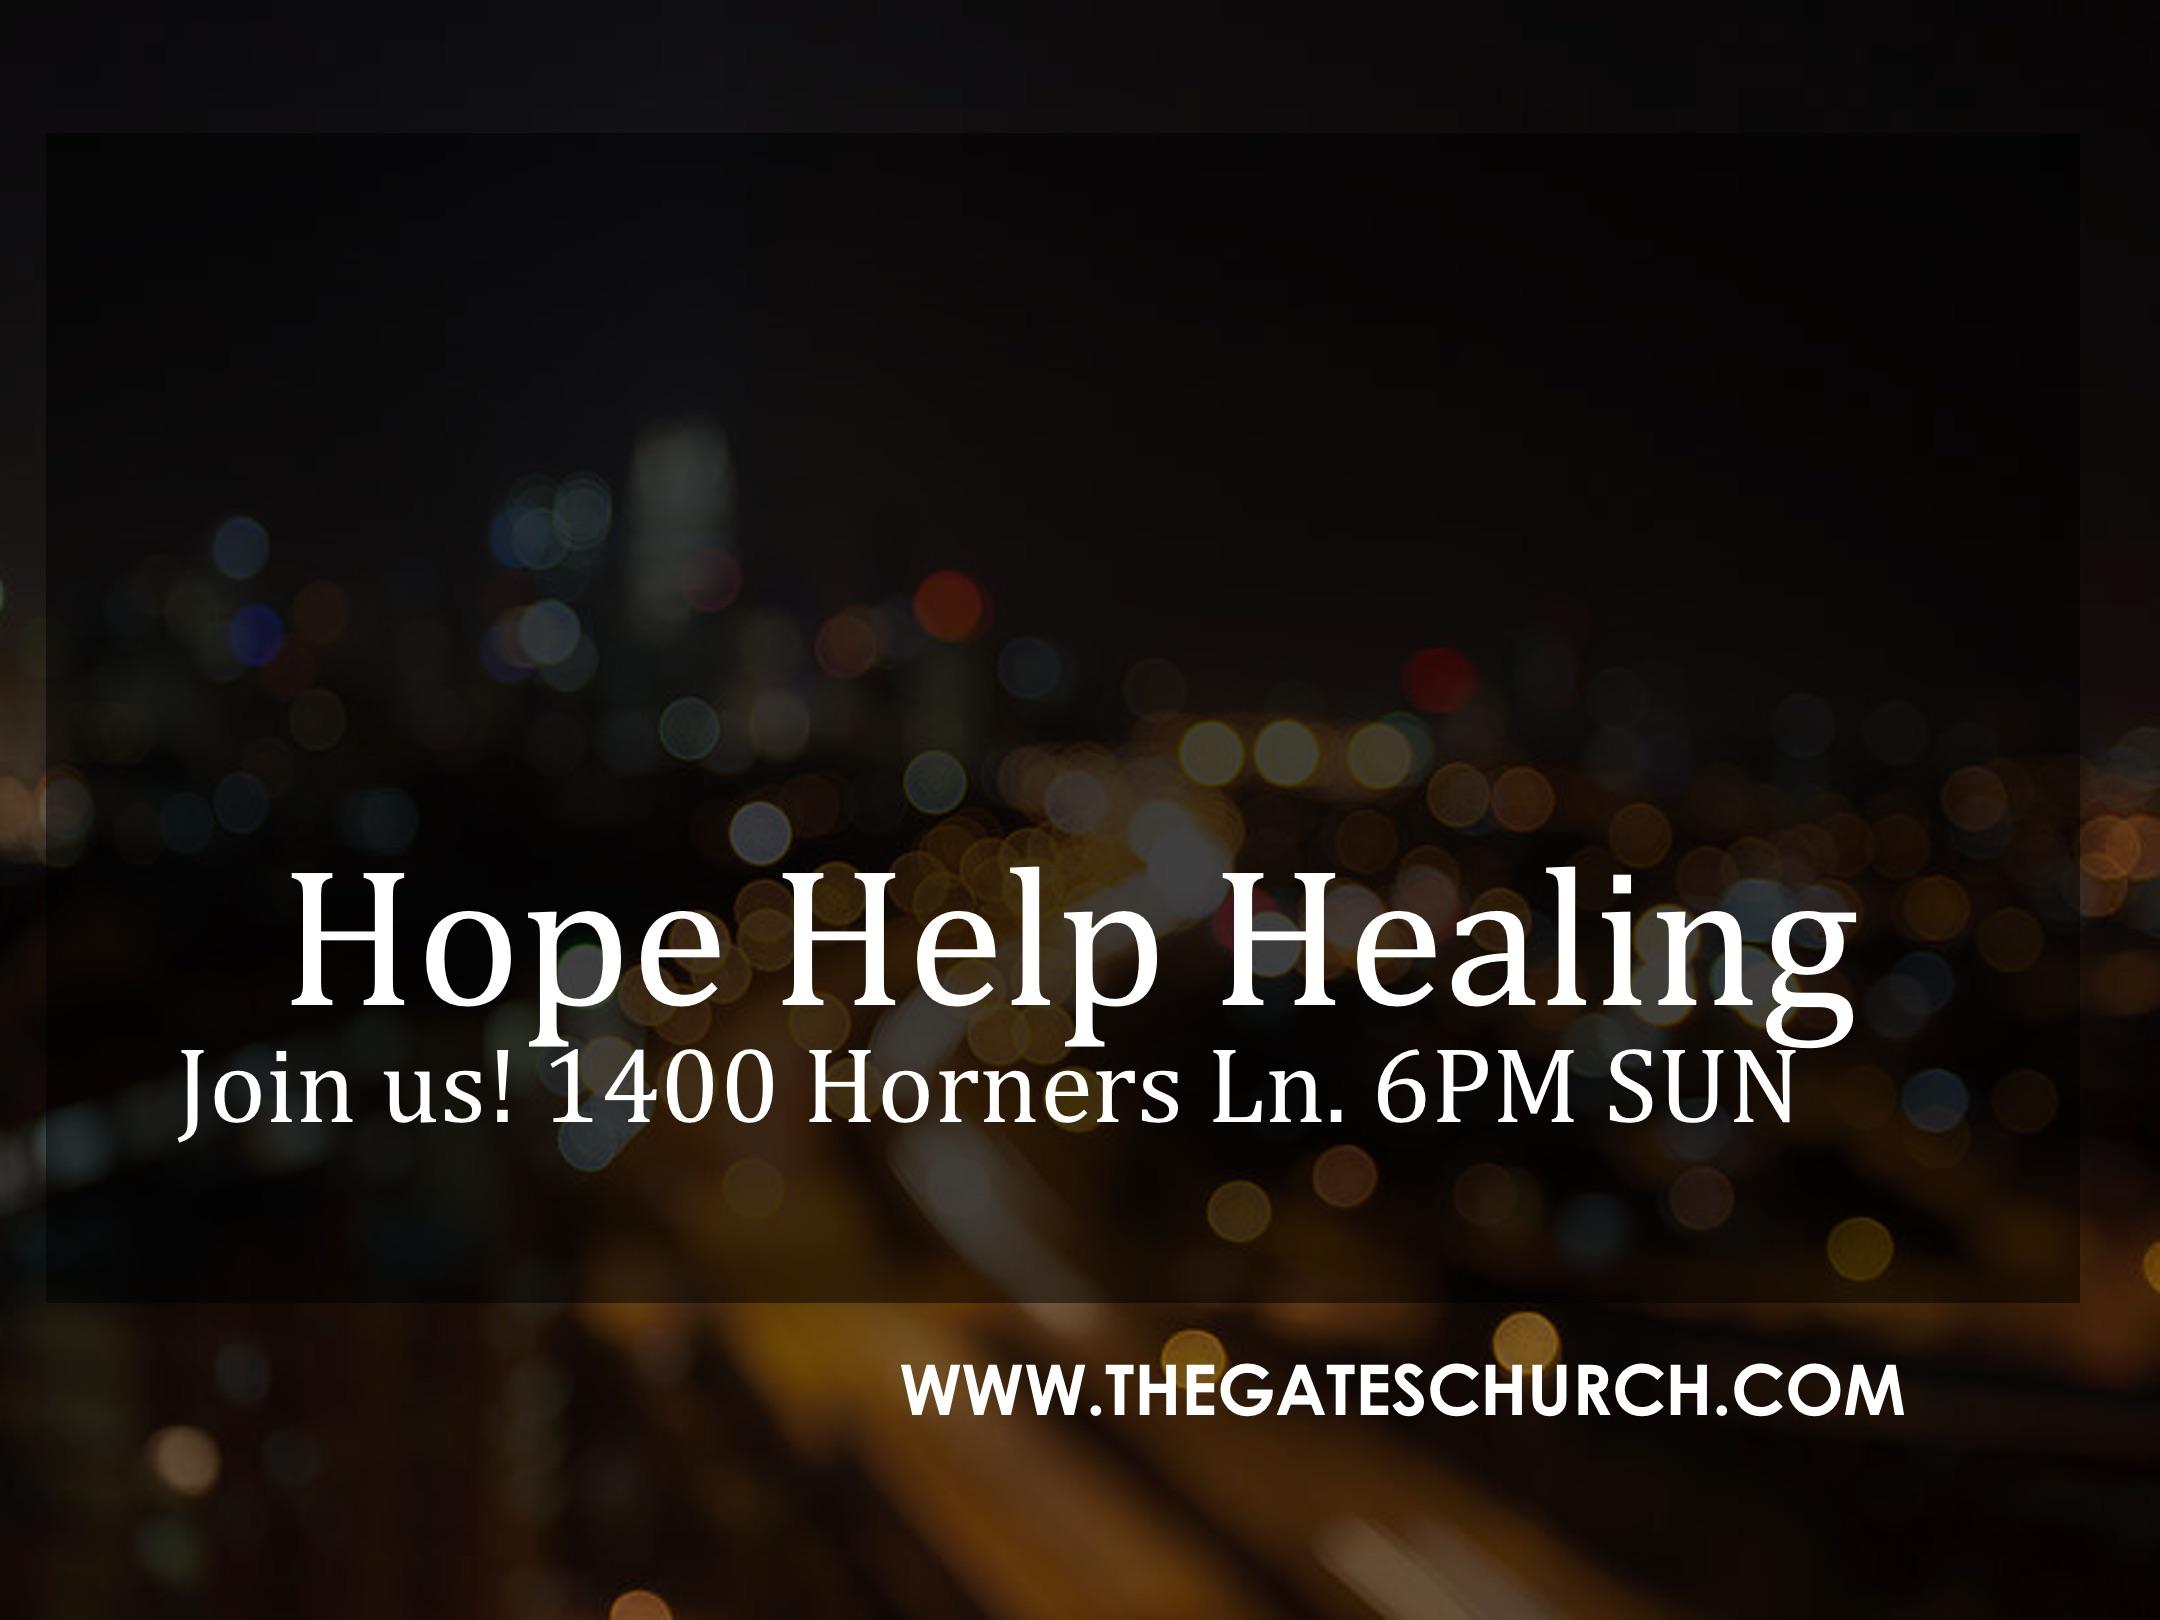 hope help and healing